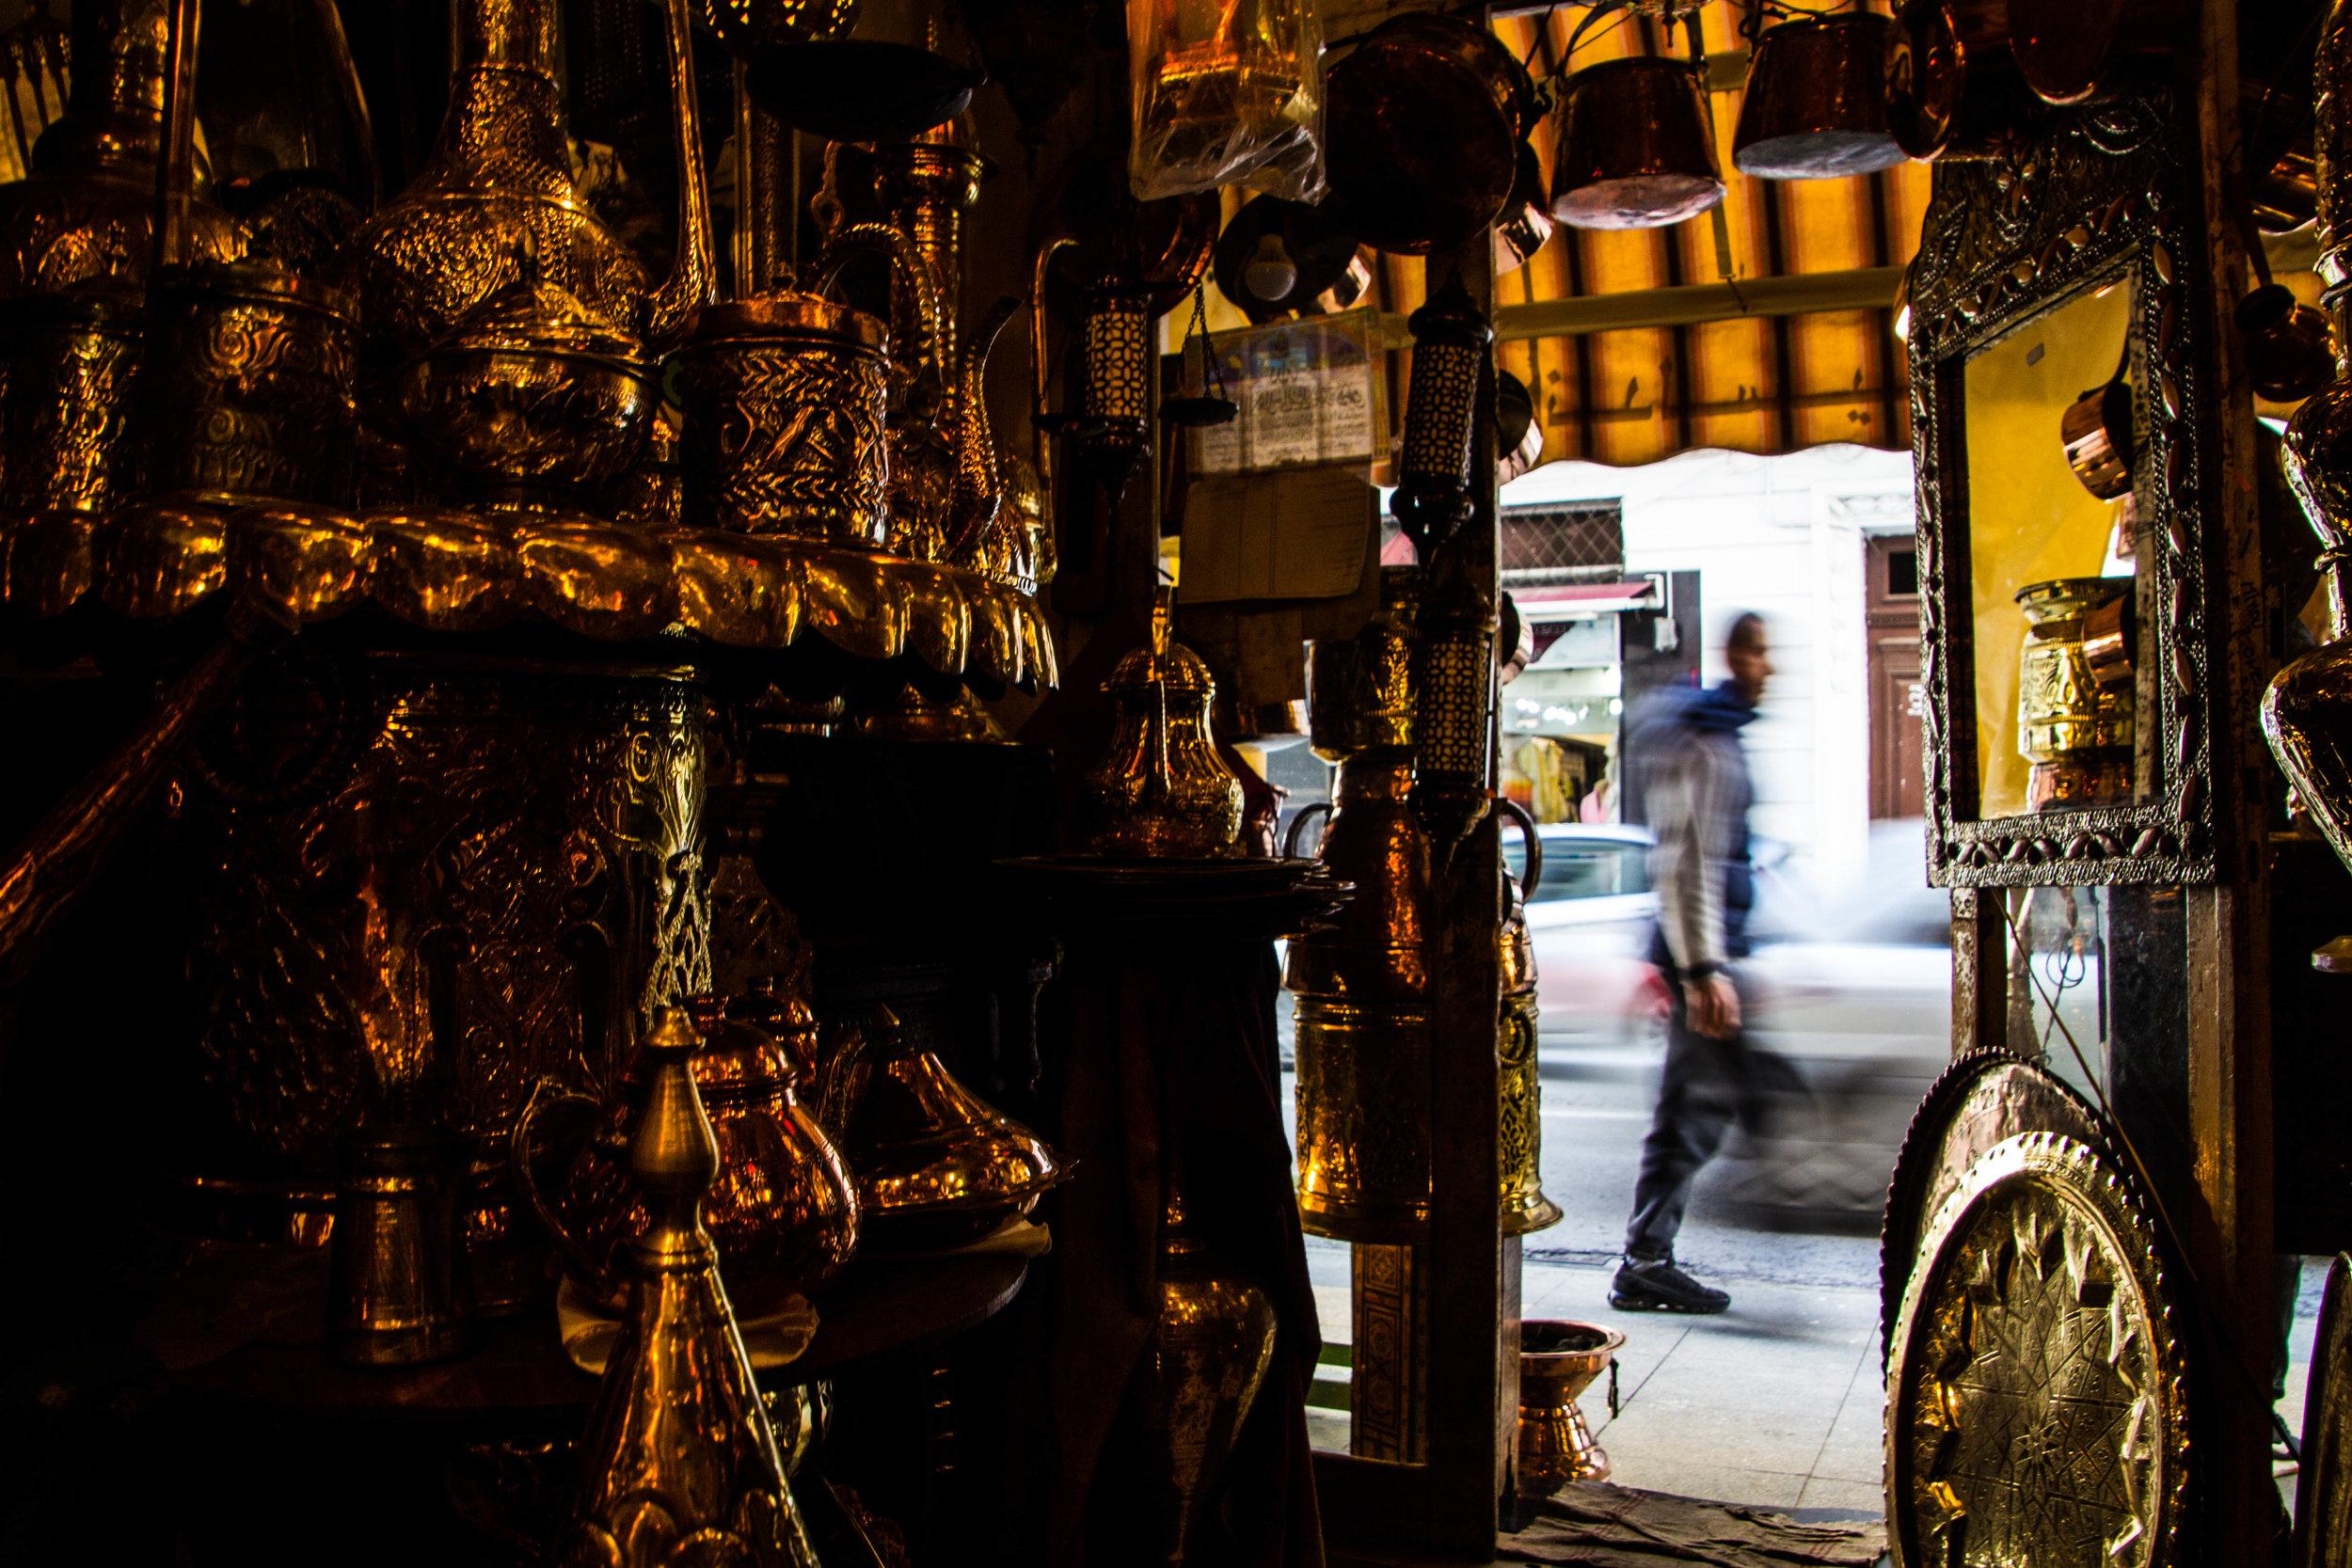 streets-algiers-algeria-5.jpg